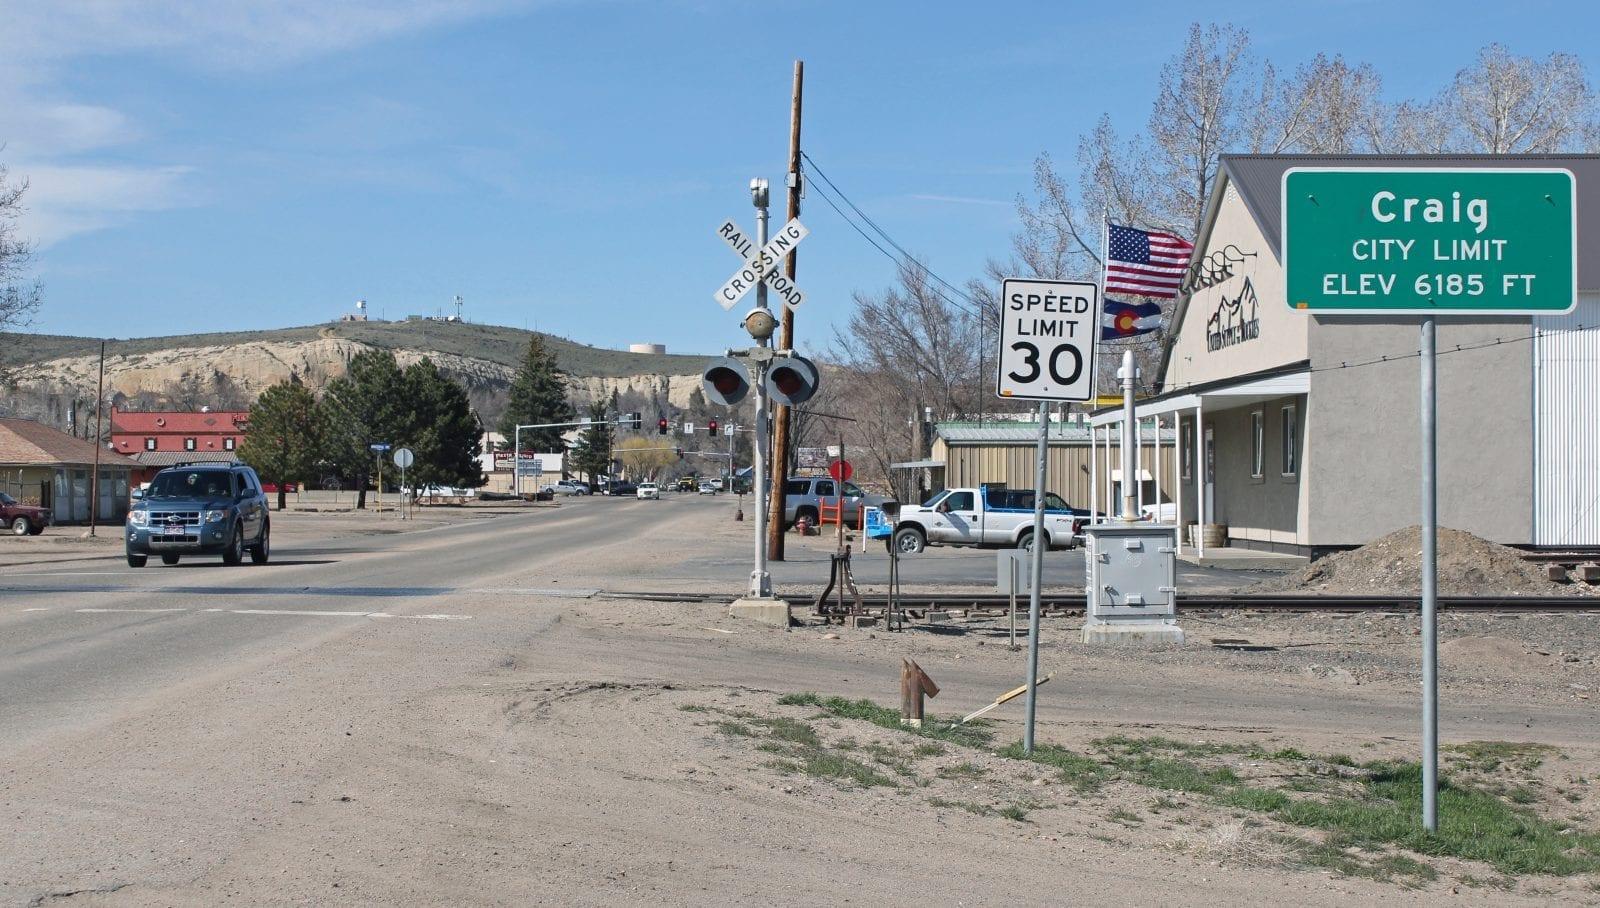 The town of Craig, Colorado